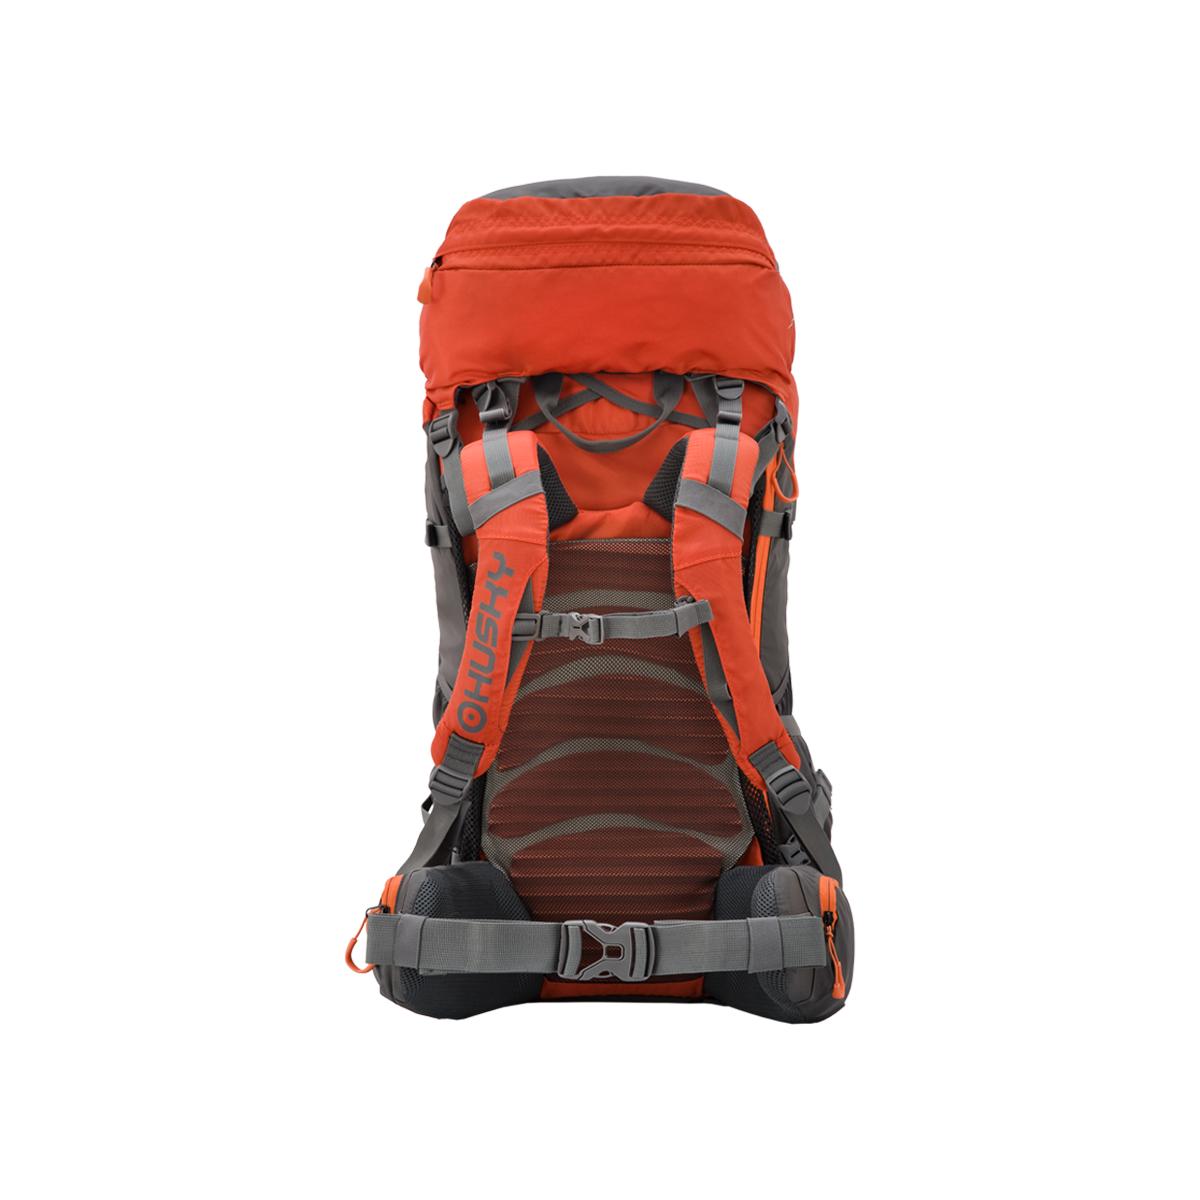 Batoh Ultralight - Rony 50l – oranžová  aaeb32f167